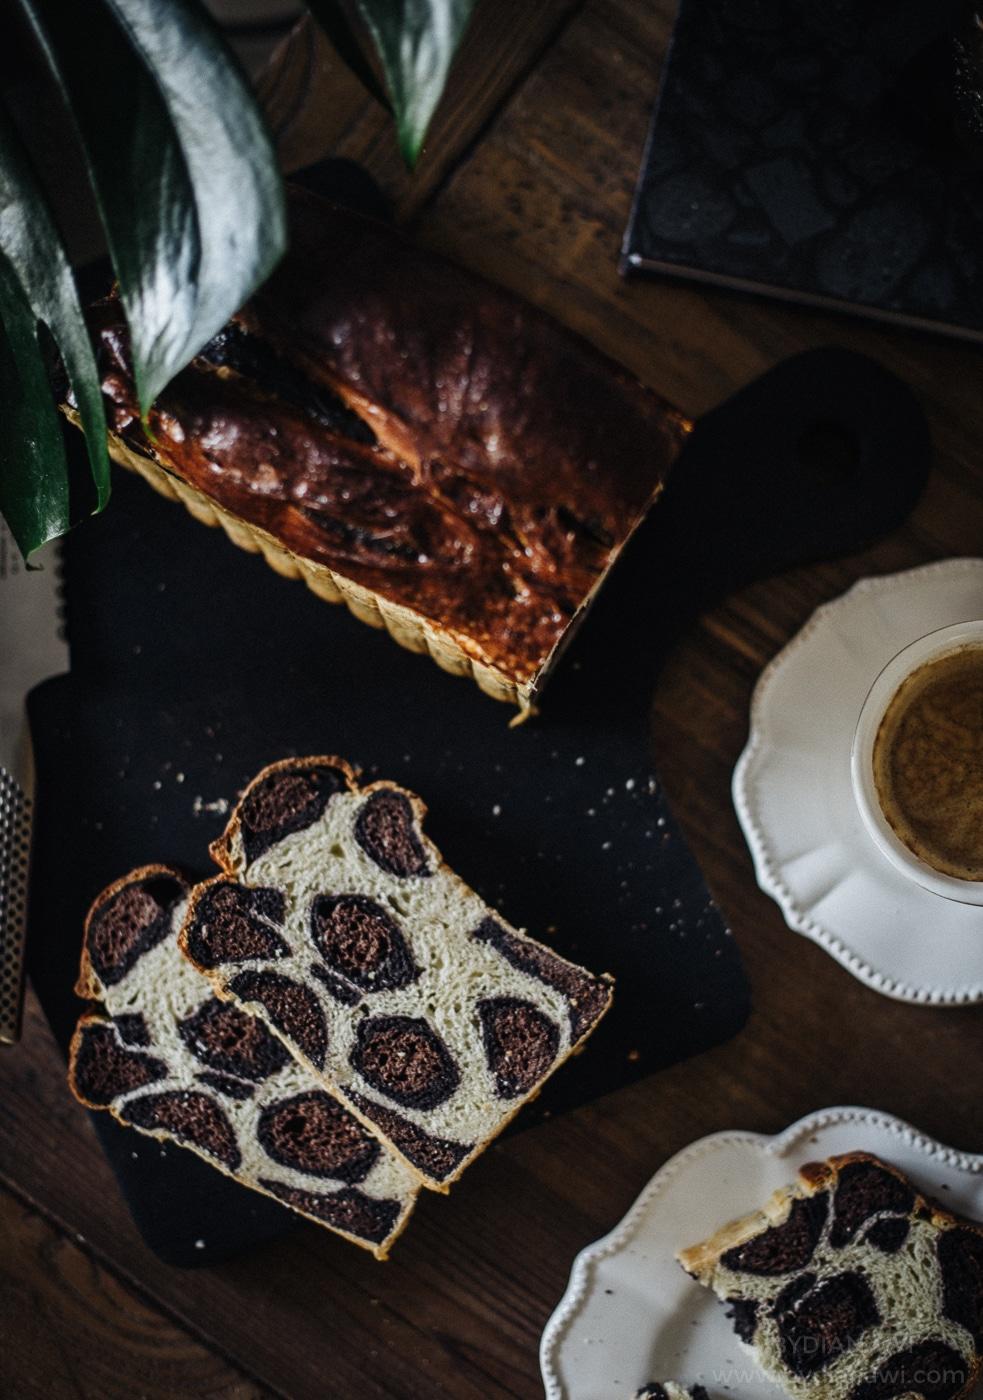 leopardbrød, brioche brød, franskbrød, leopard brød, veninde brunch